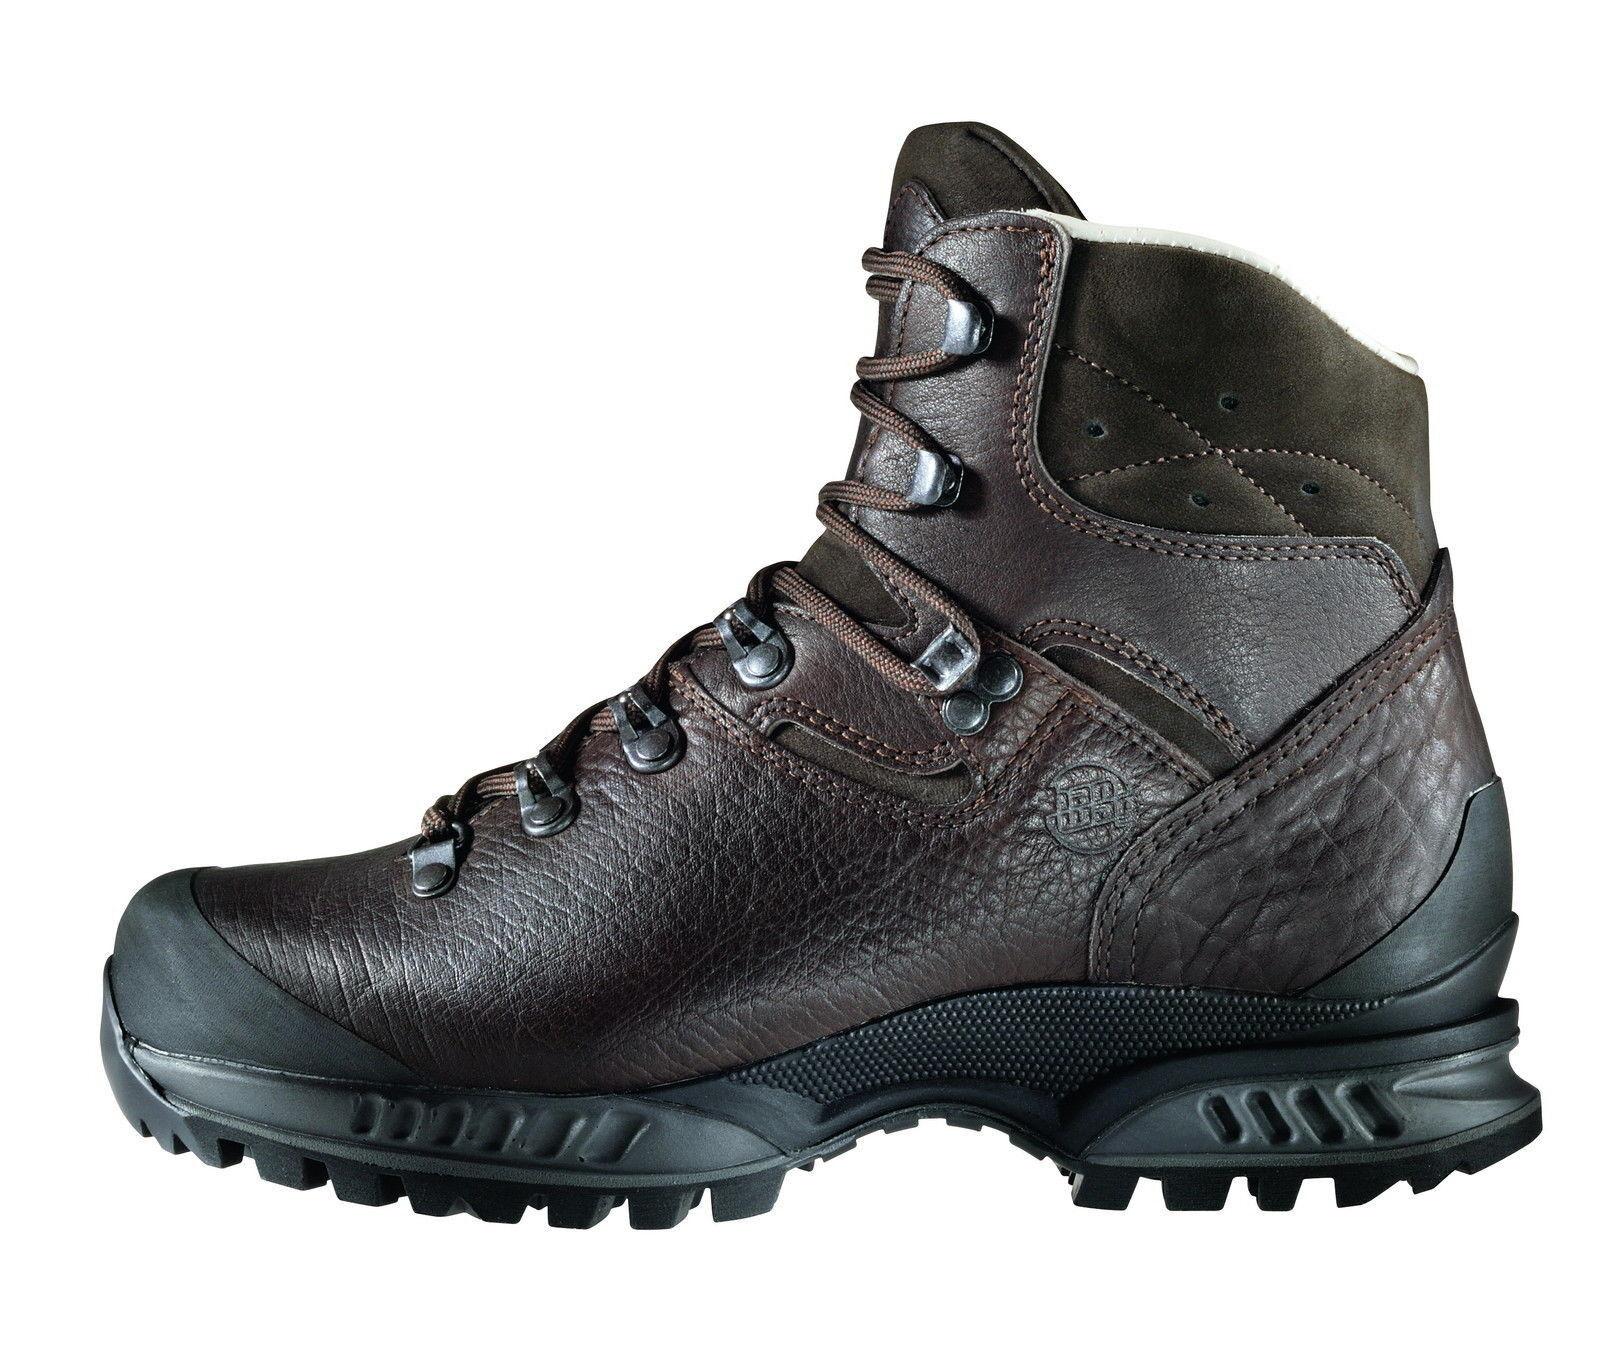 Hanwag Trekking  Yak shoes Lhasa Size 11 - 46 Marone  high quality